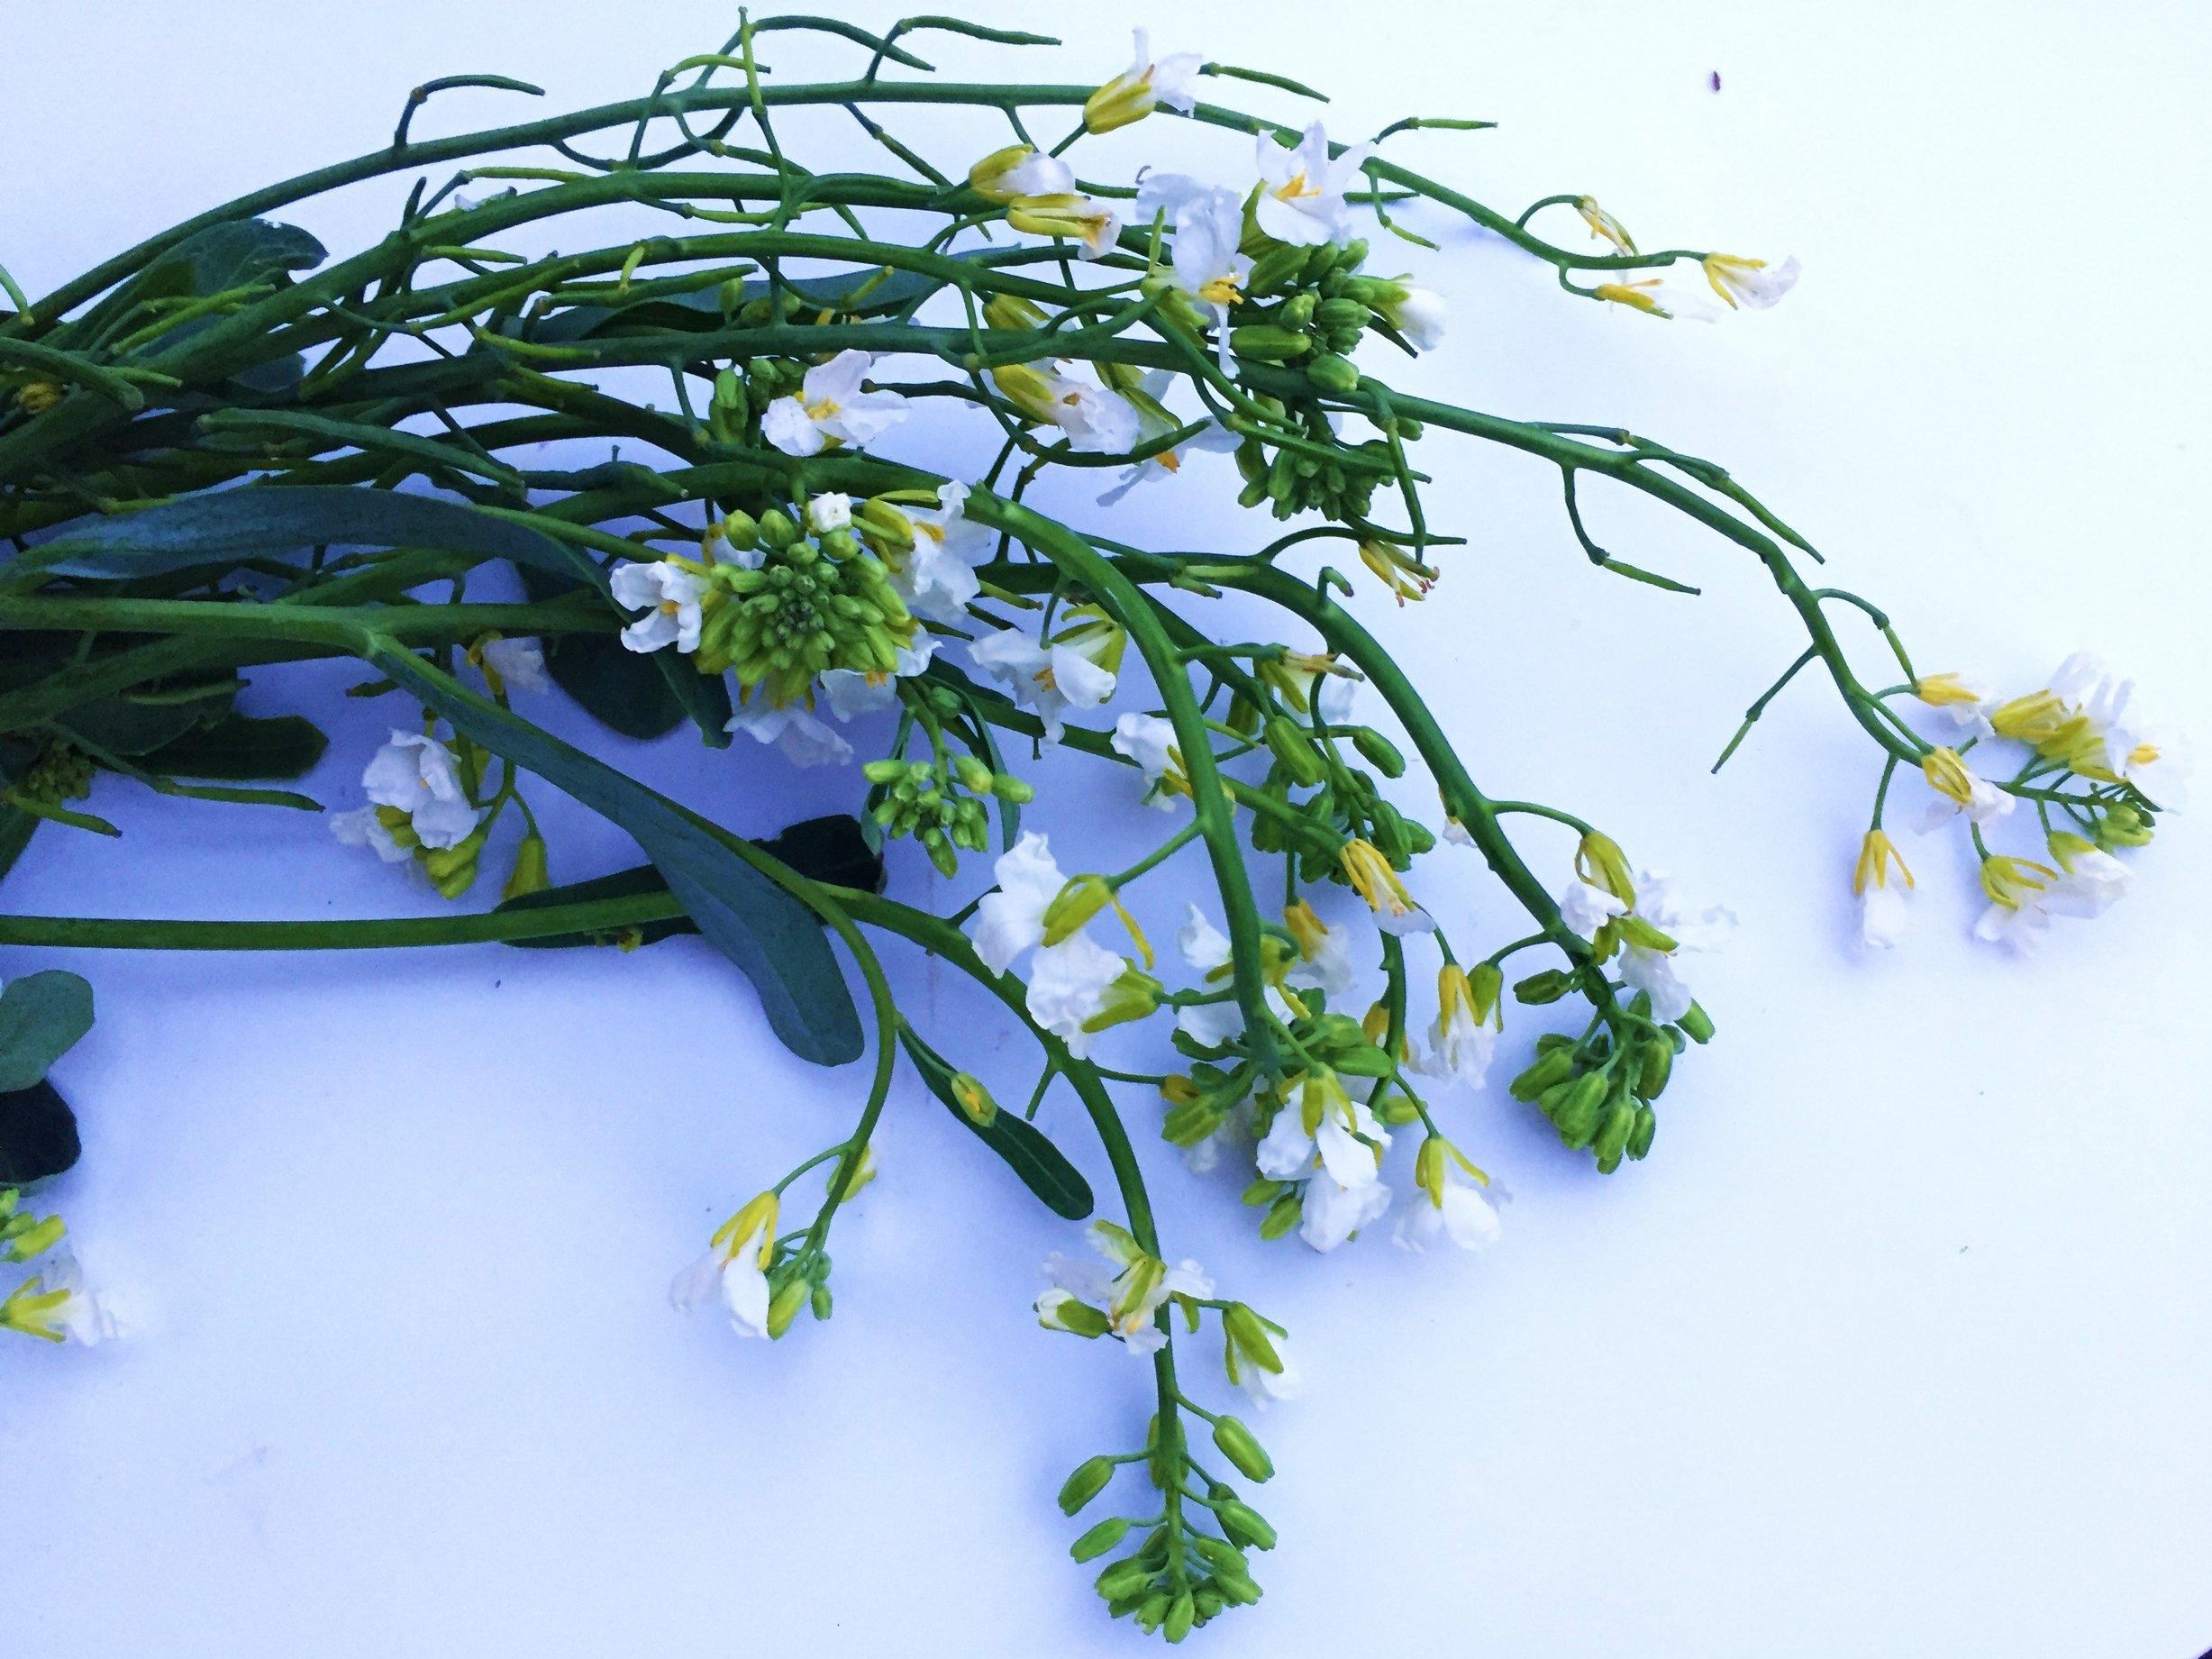 Close-up of broccoli blossoms.